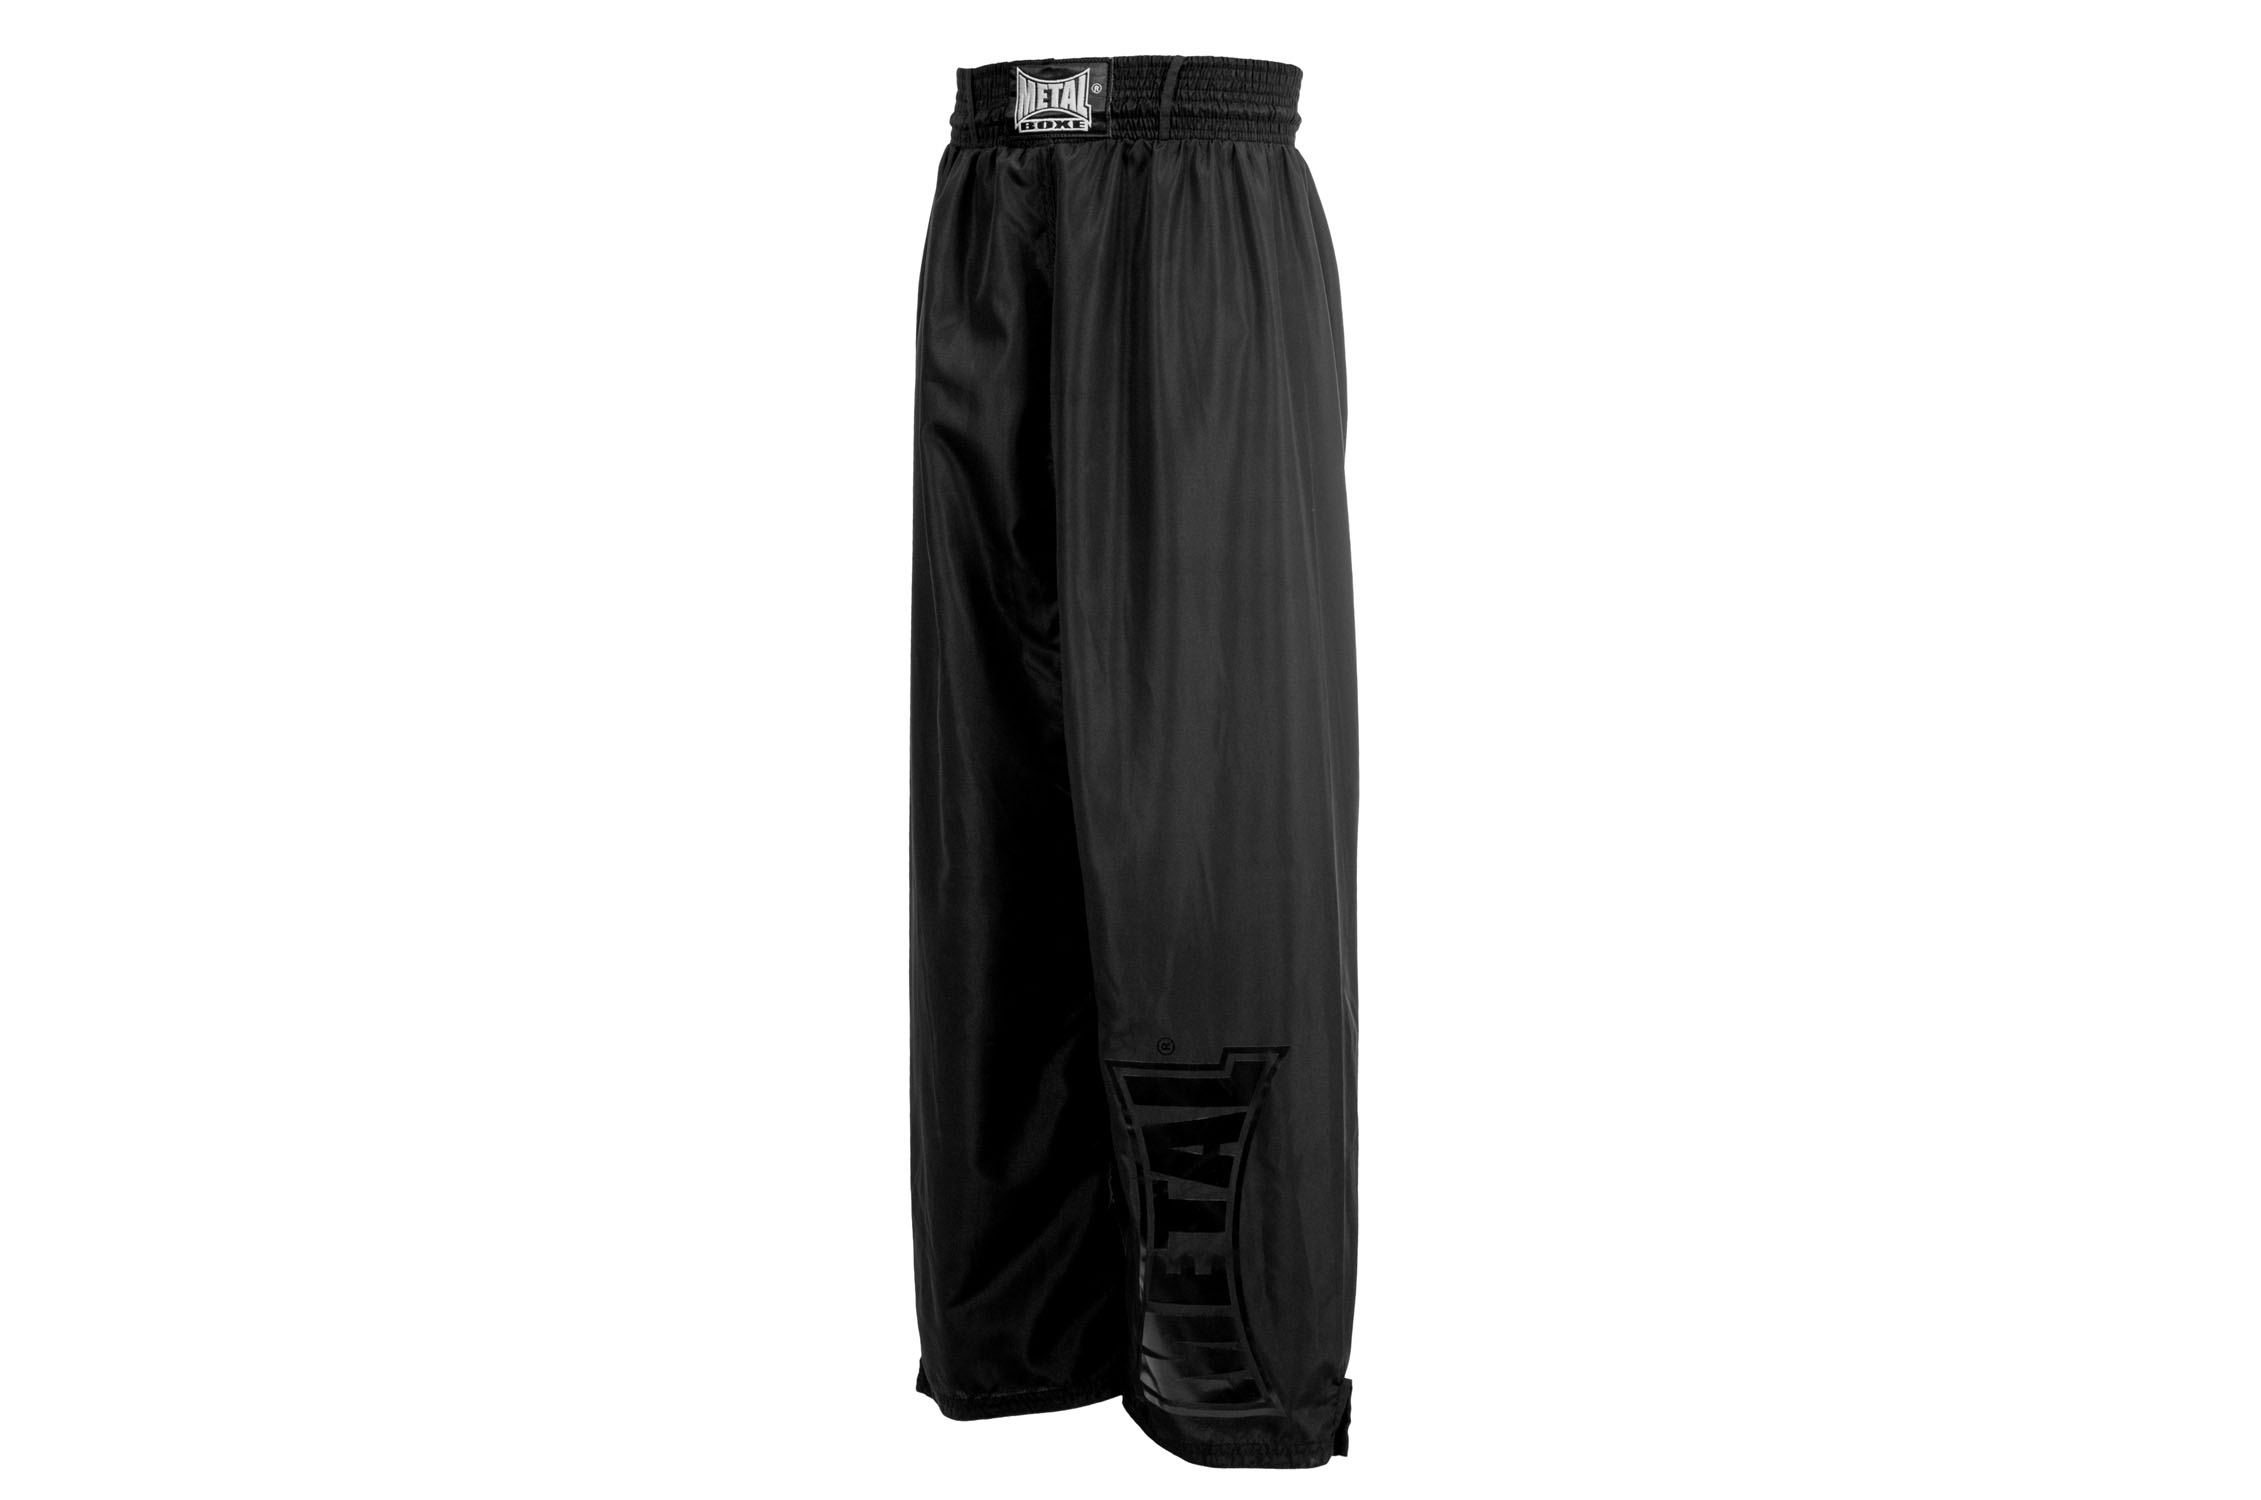 Pantalon Full Contact Visual ''MB59M'', Metal Boxe